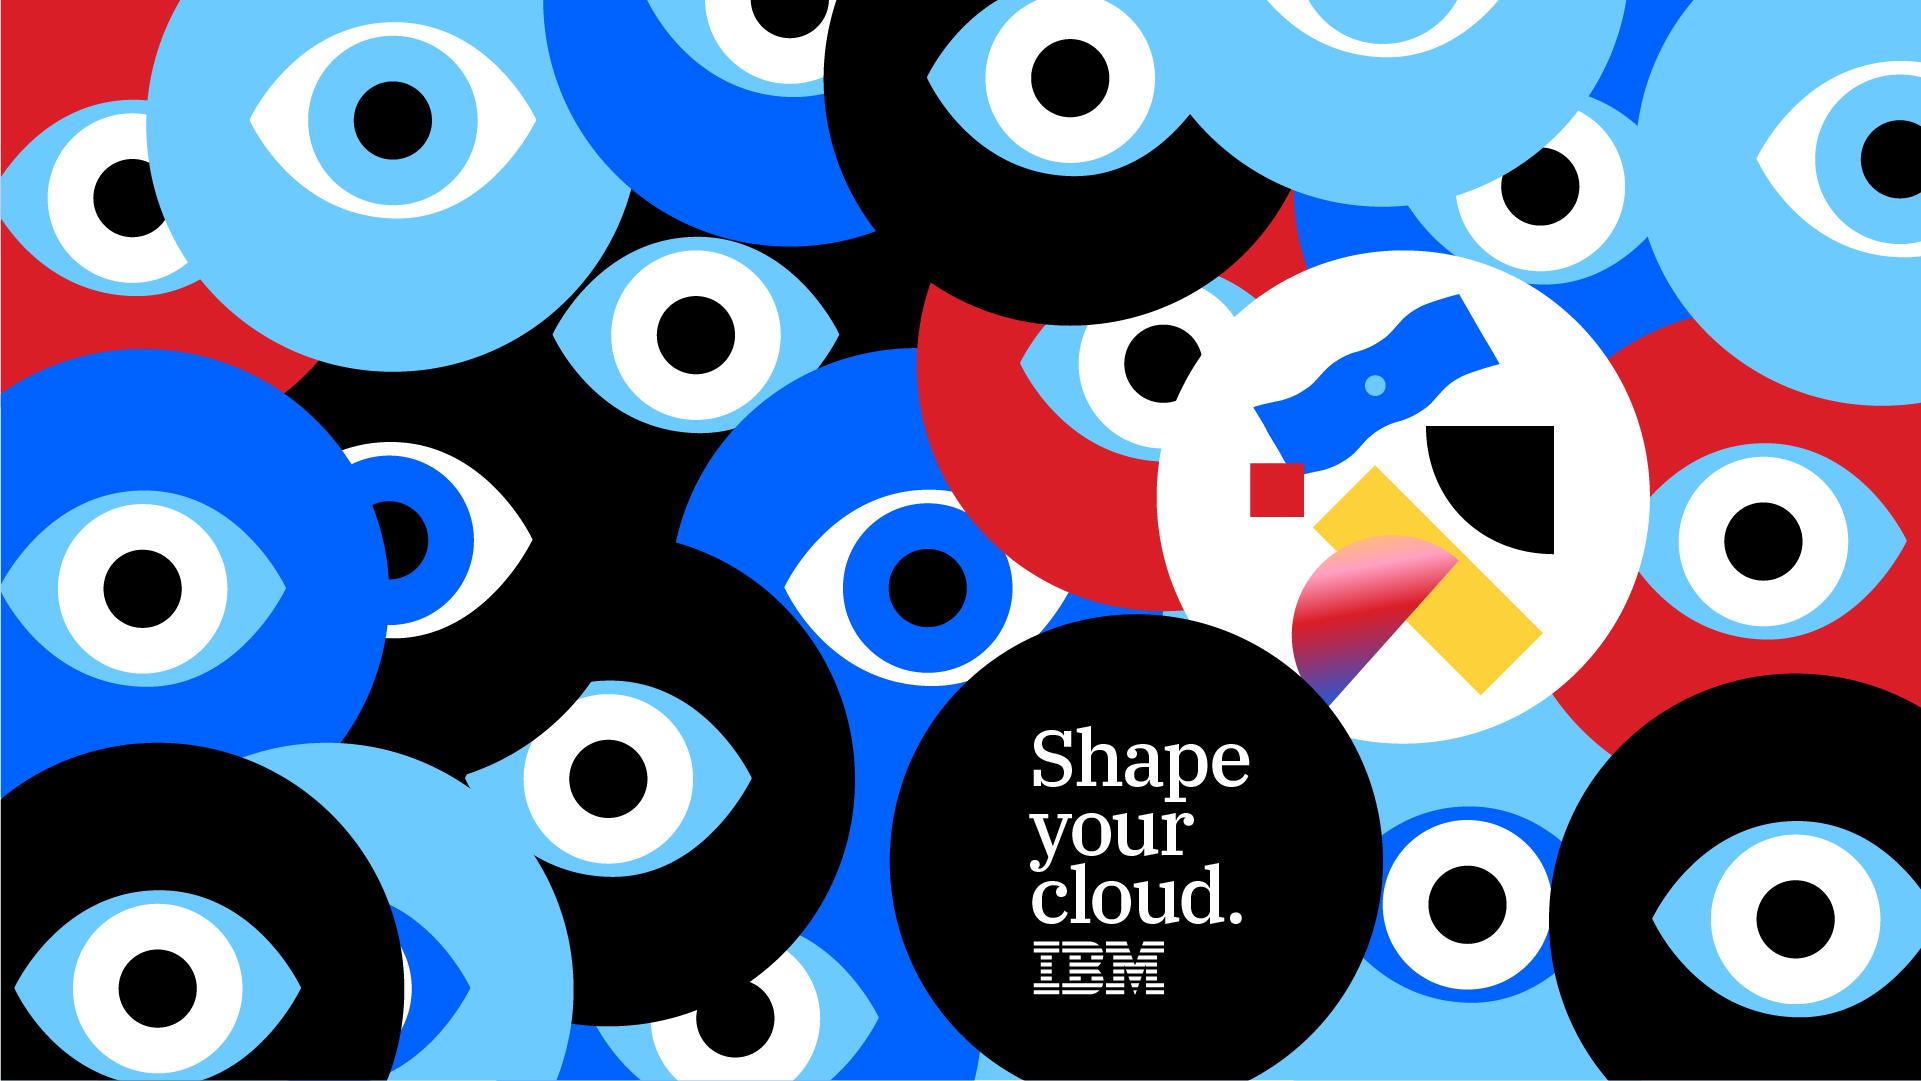 IBM_SHAPE-YOUR-CLOUD_DC_EDITS_BH_proceso_IBM-process-21.jpg